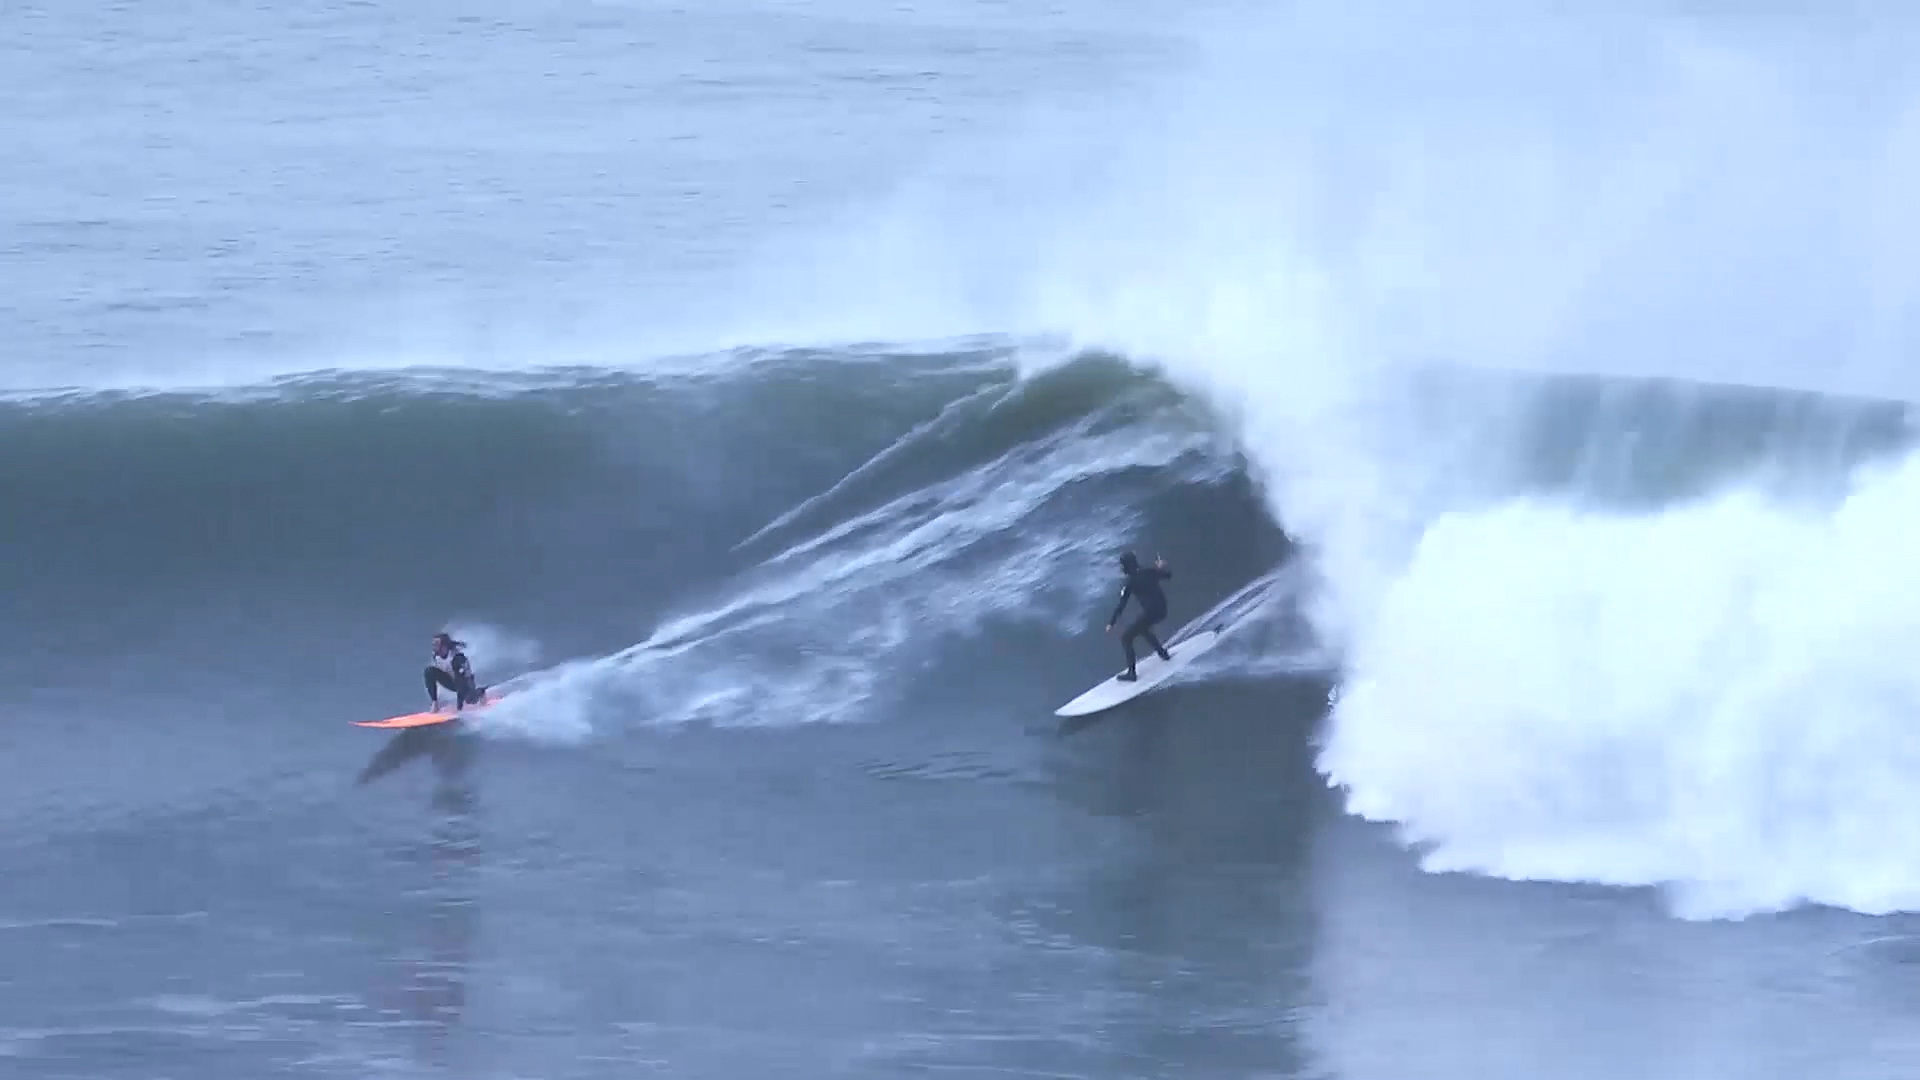 Big Wave in the Basque Country Ingles, with Laurels. Azkena Carrascon.MP4.Imagen fija030.jpg